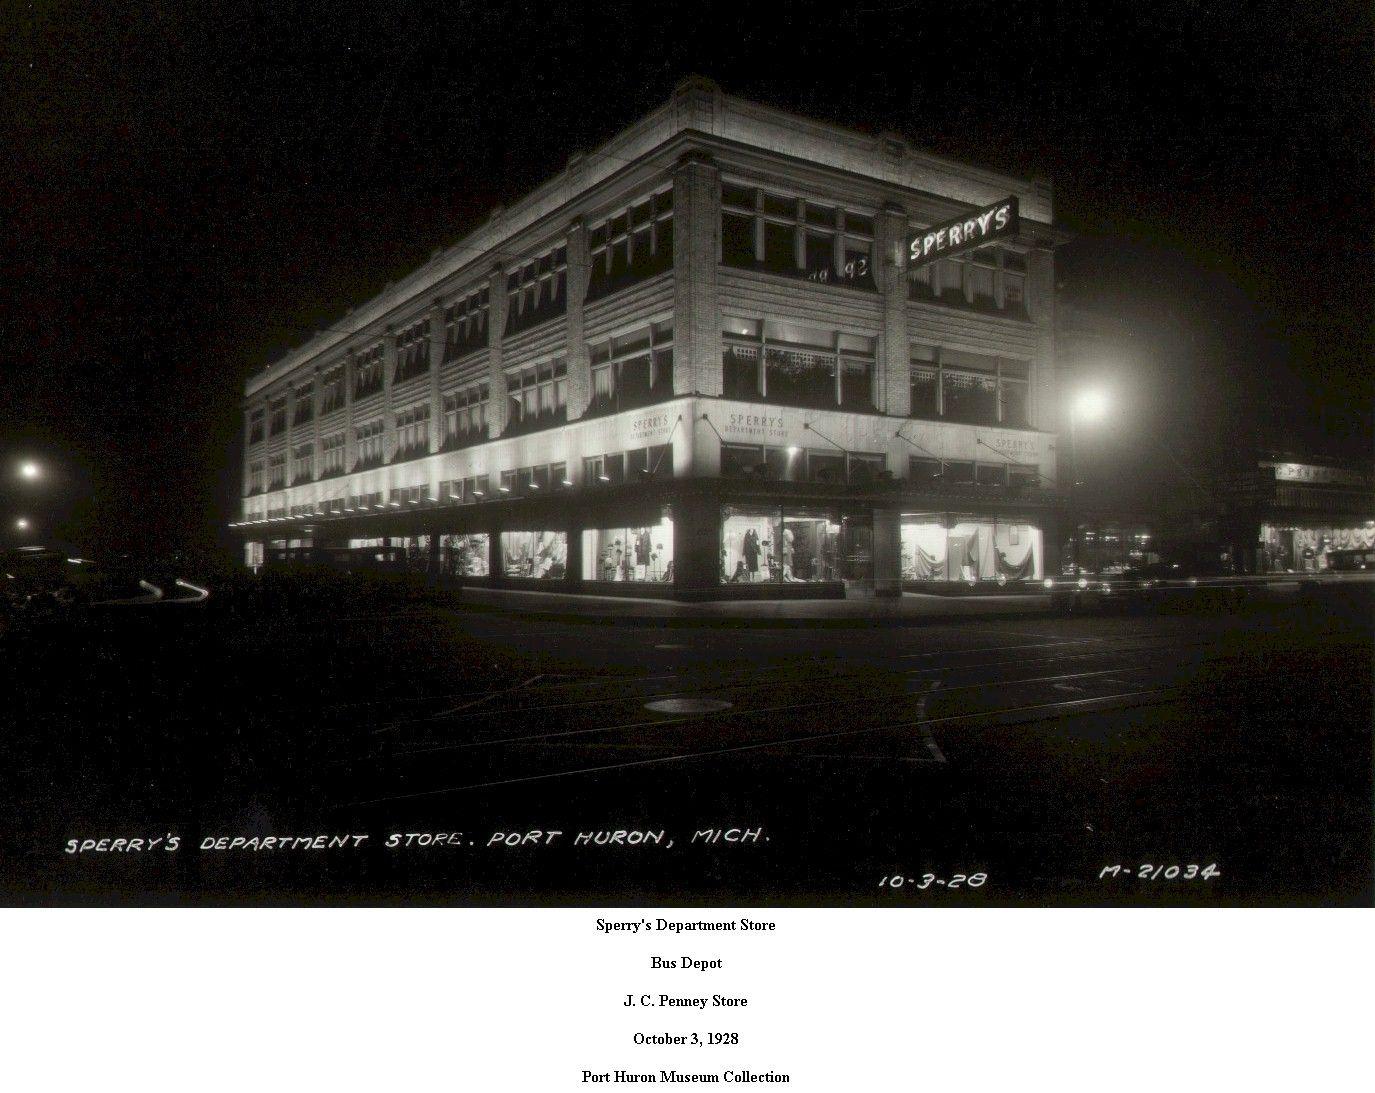 SPERRY'S DEPARTMENT STORE. PORT HURON MI. Port huron